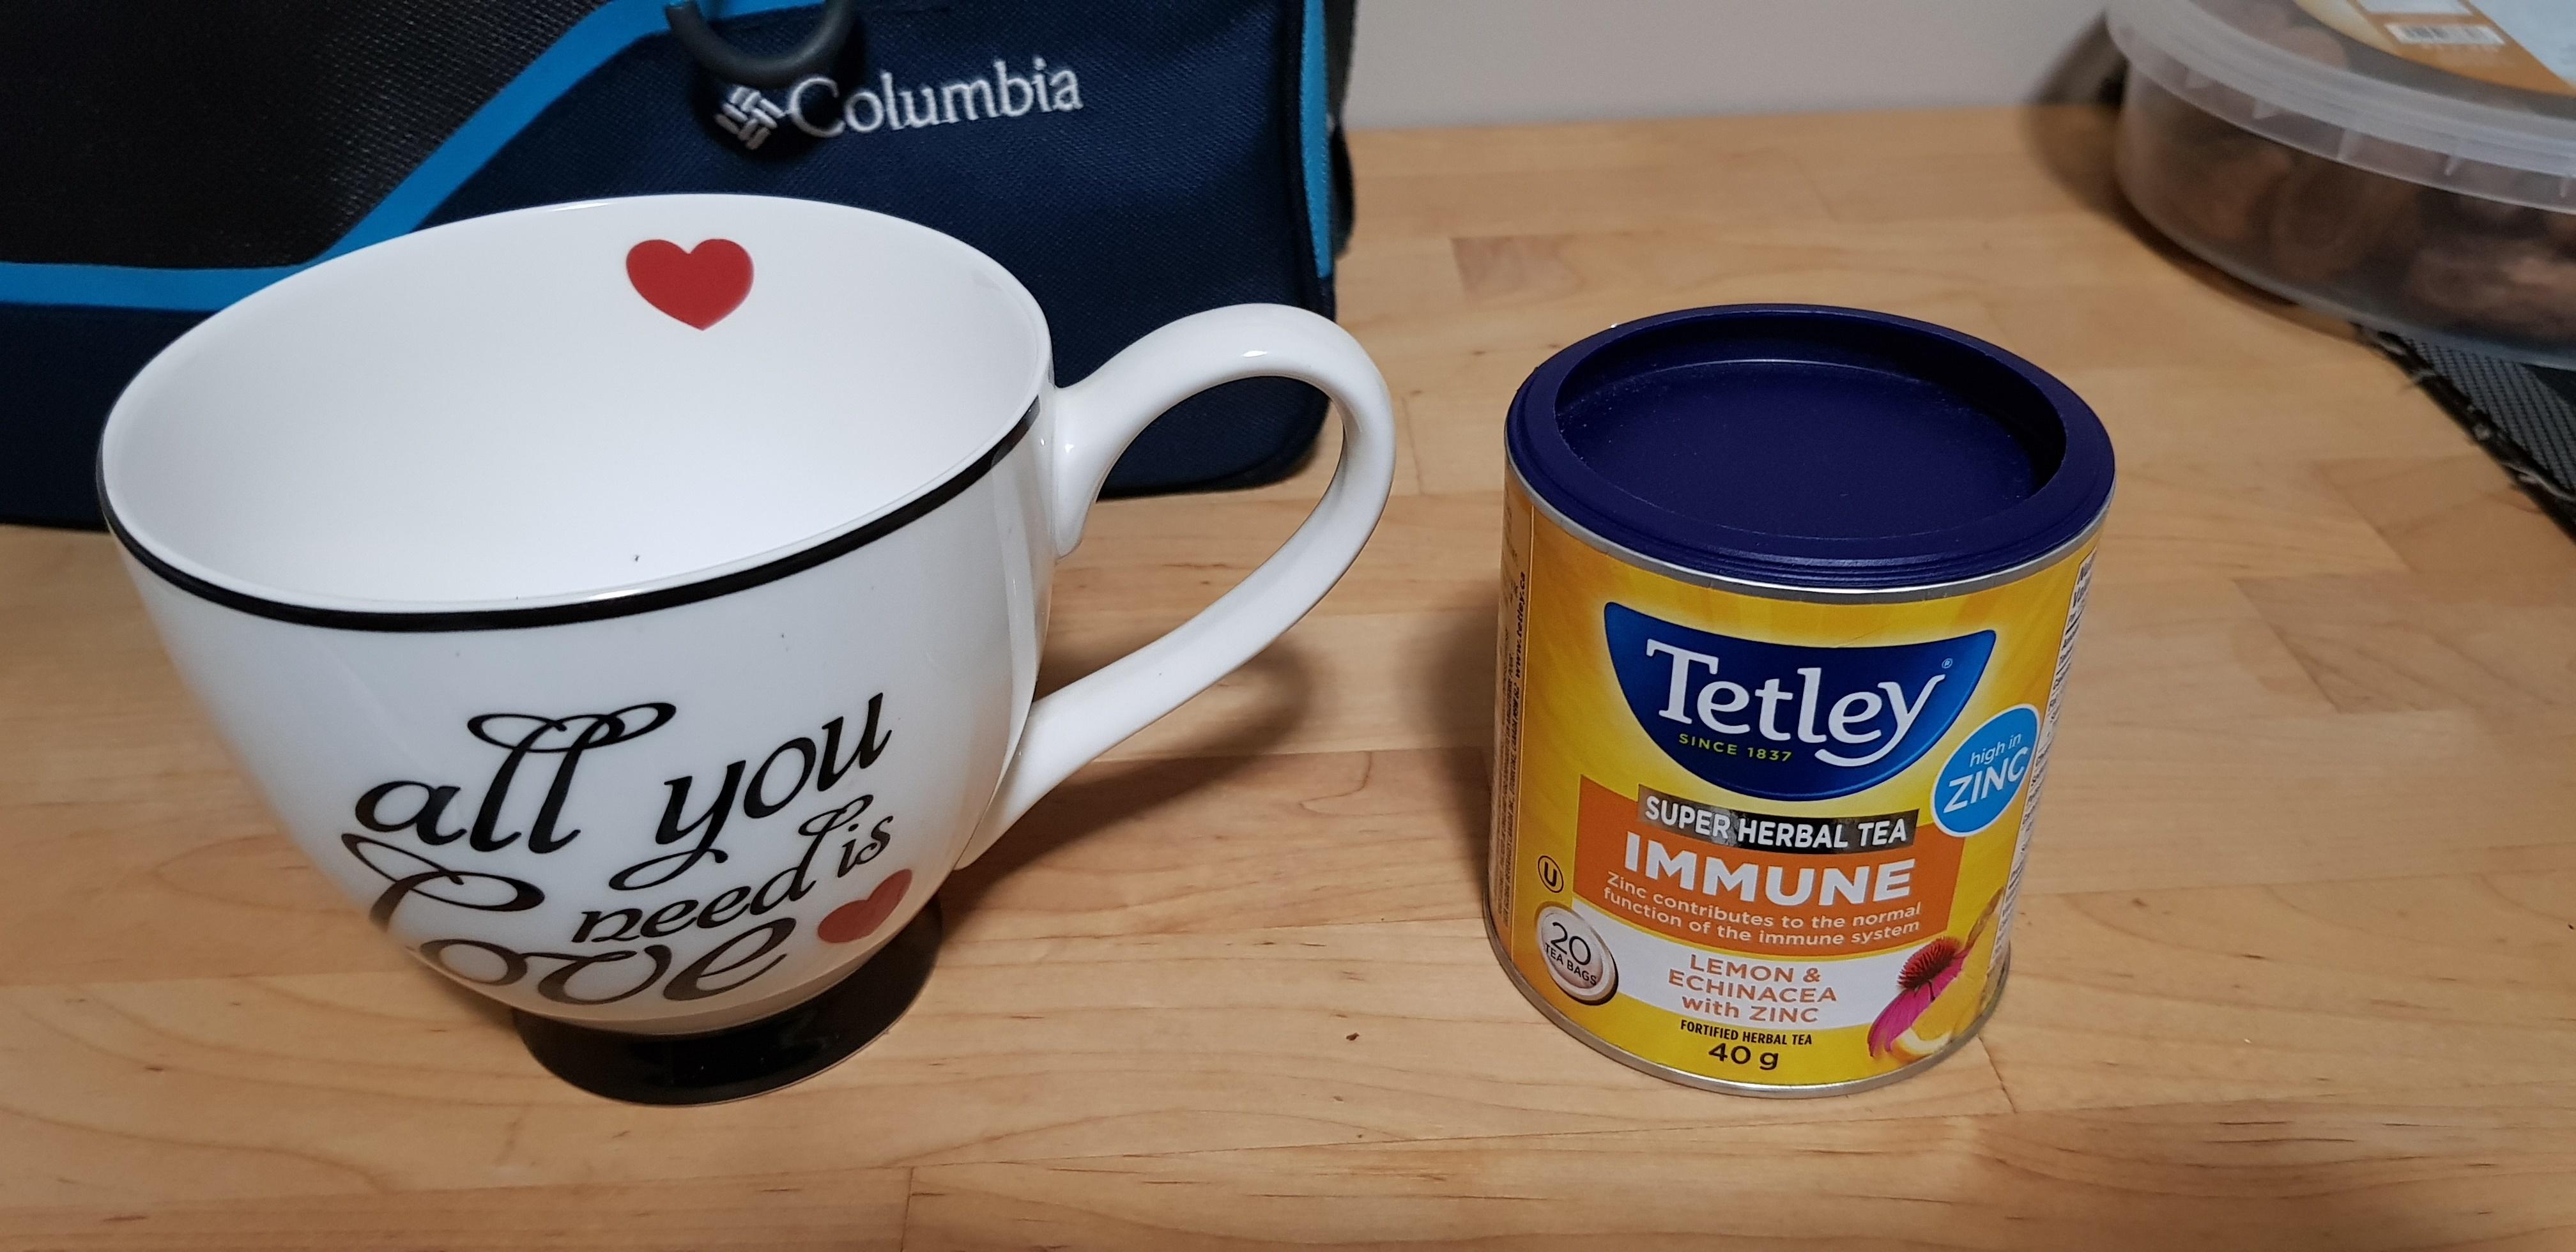 Tetley Super Herbal Tea Immune - Lemon & Echinacea with Zinc